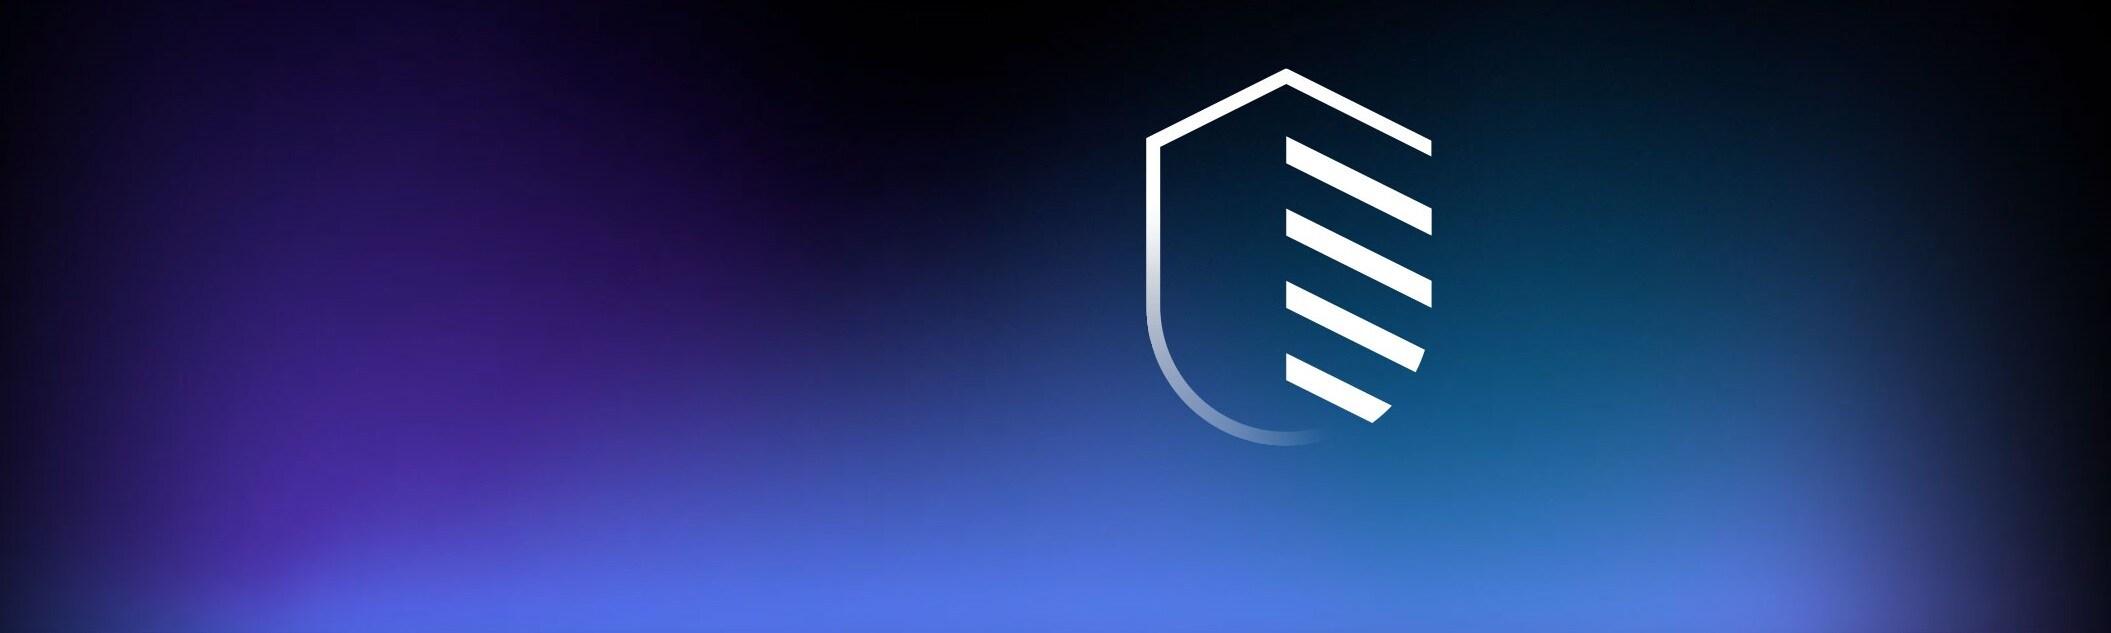 IBM security shield